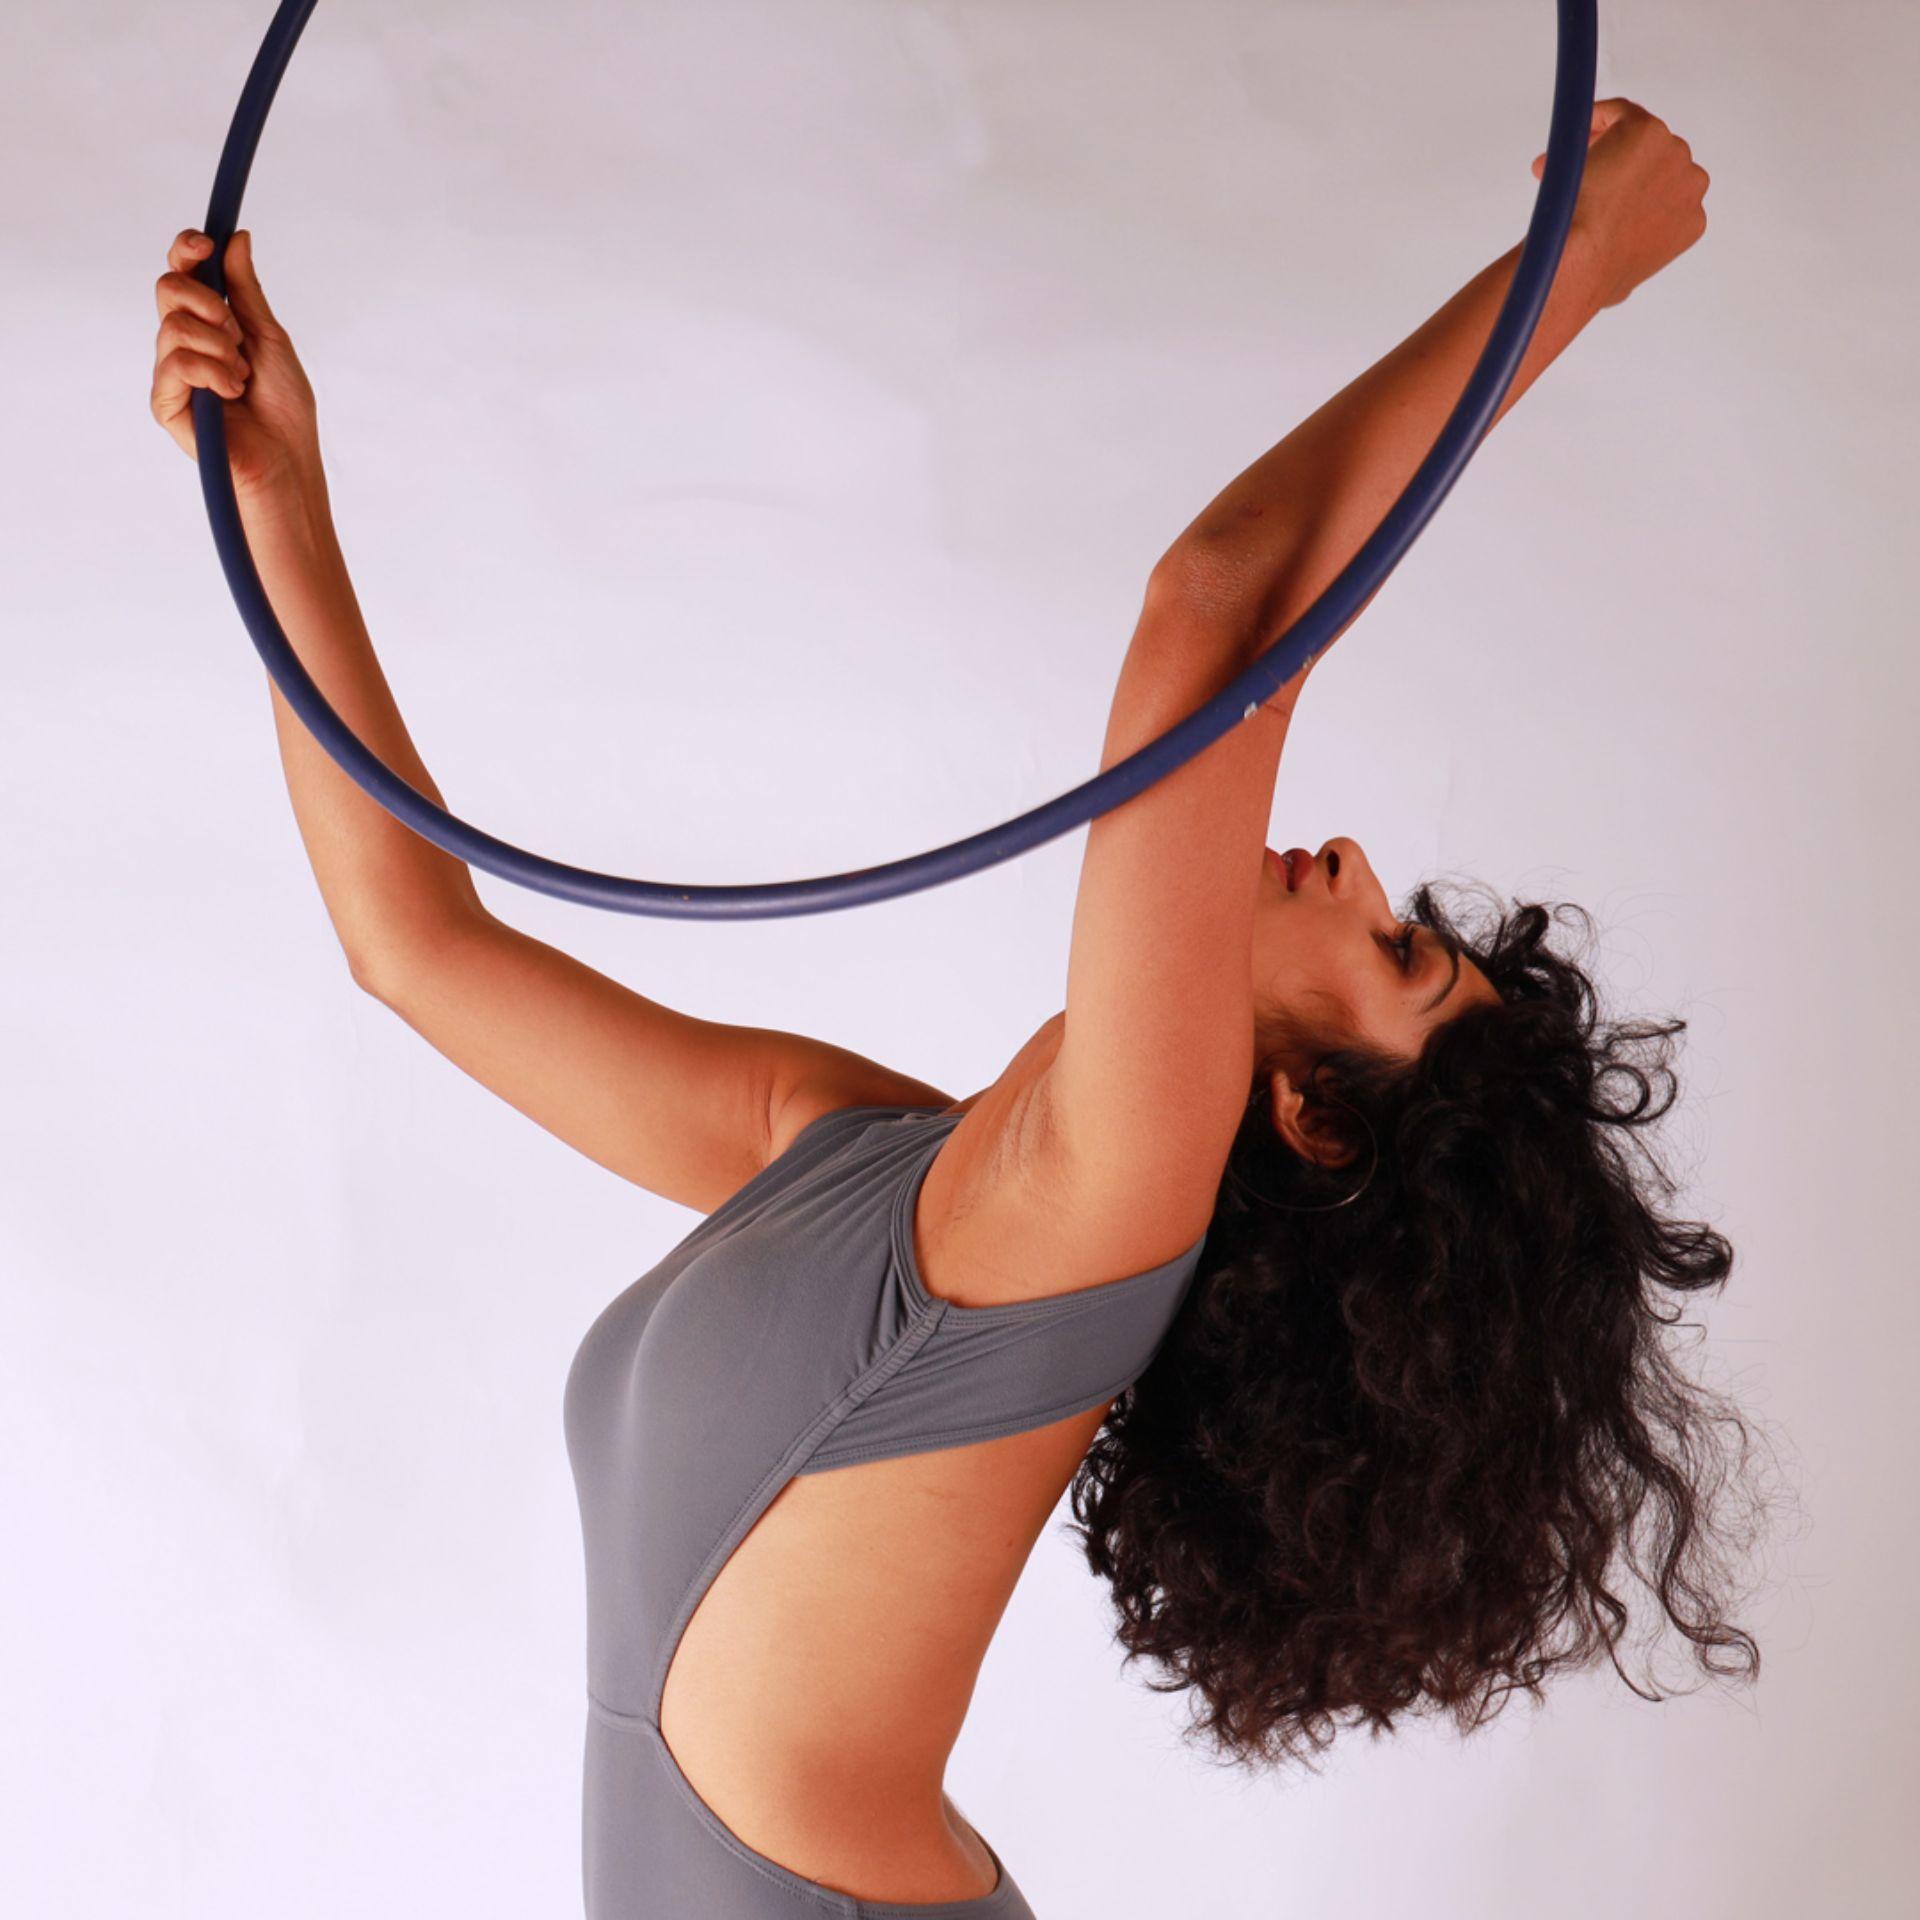 Posing hoop dance single ring hula long hair leotard grey white background